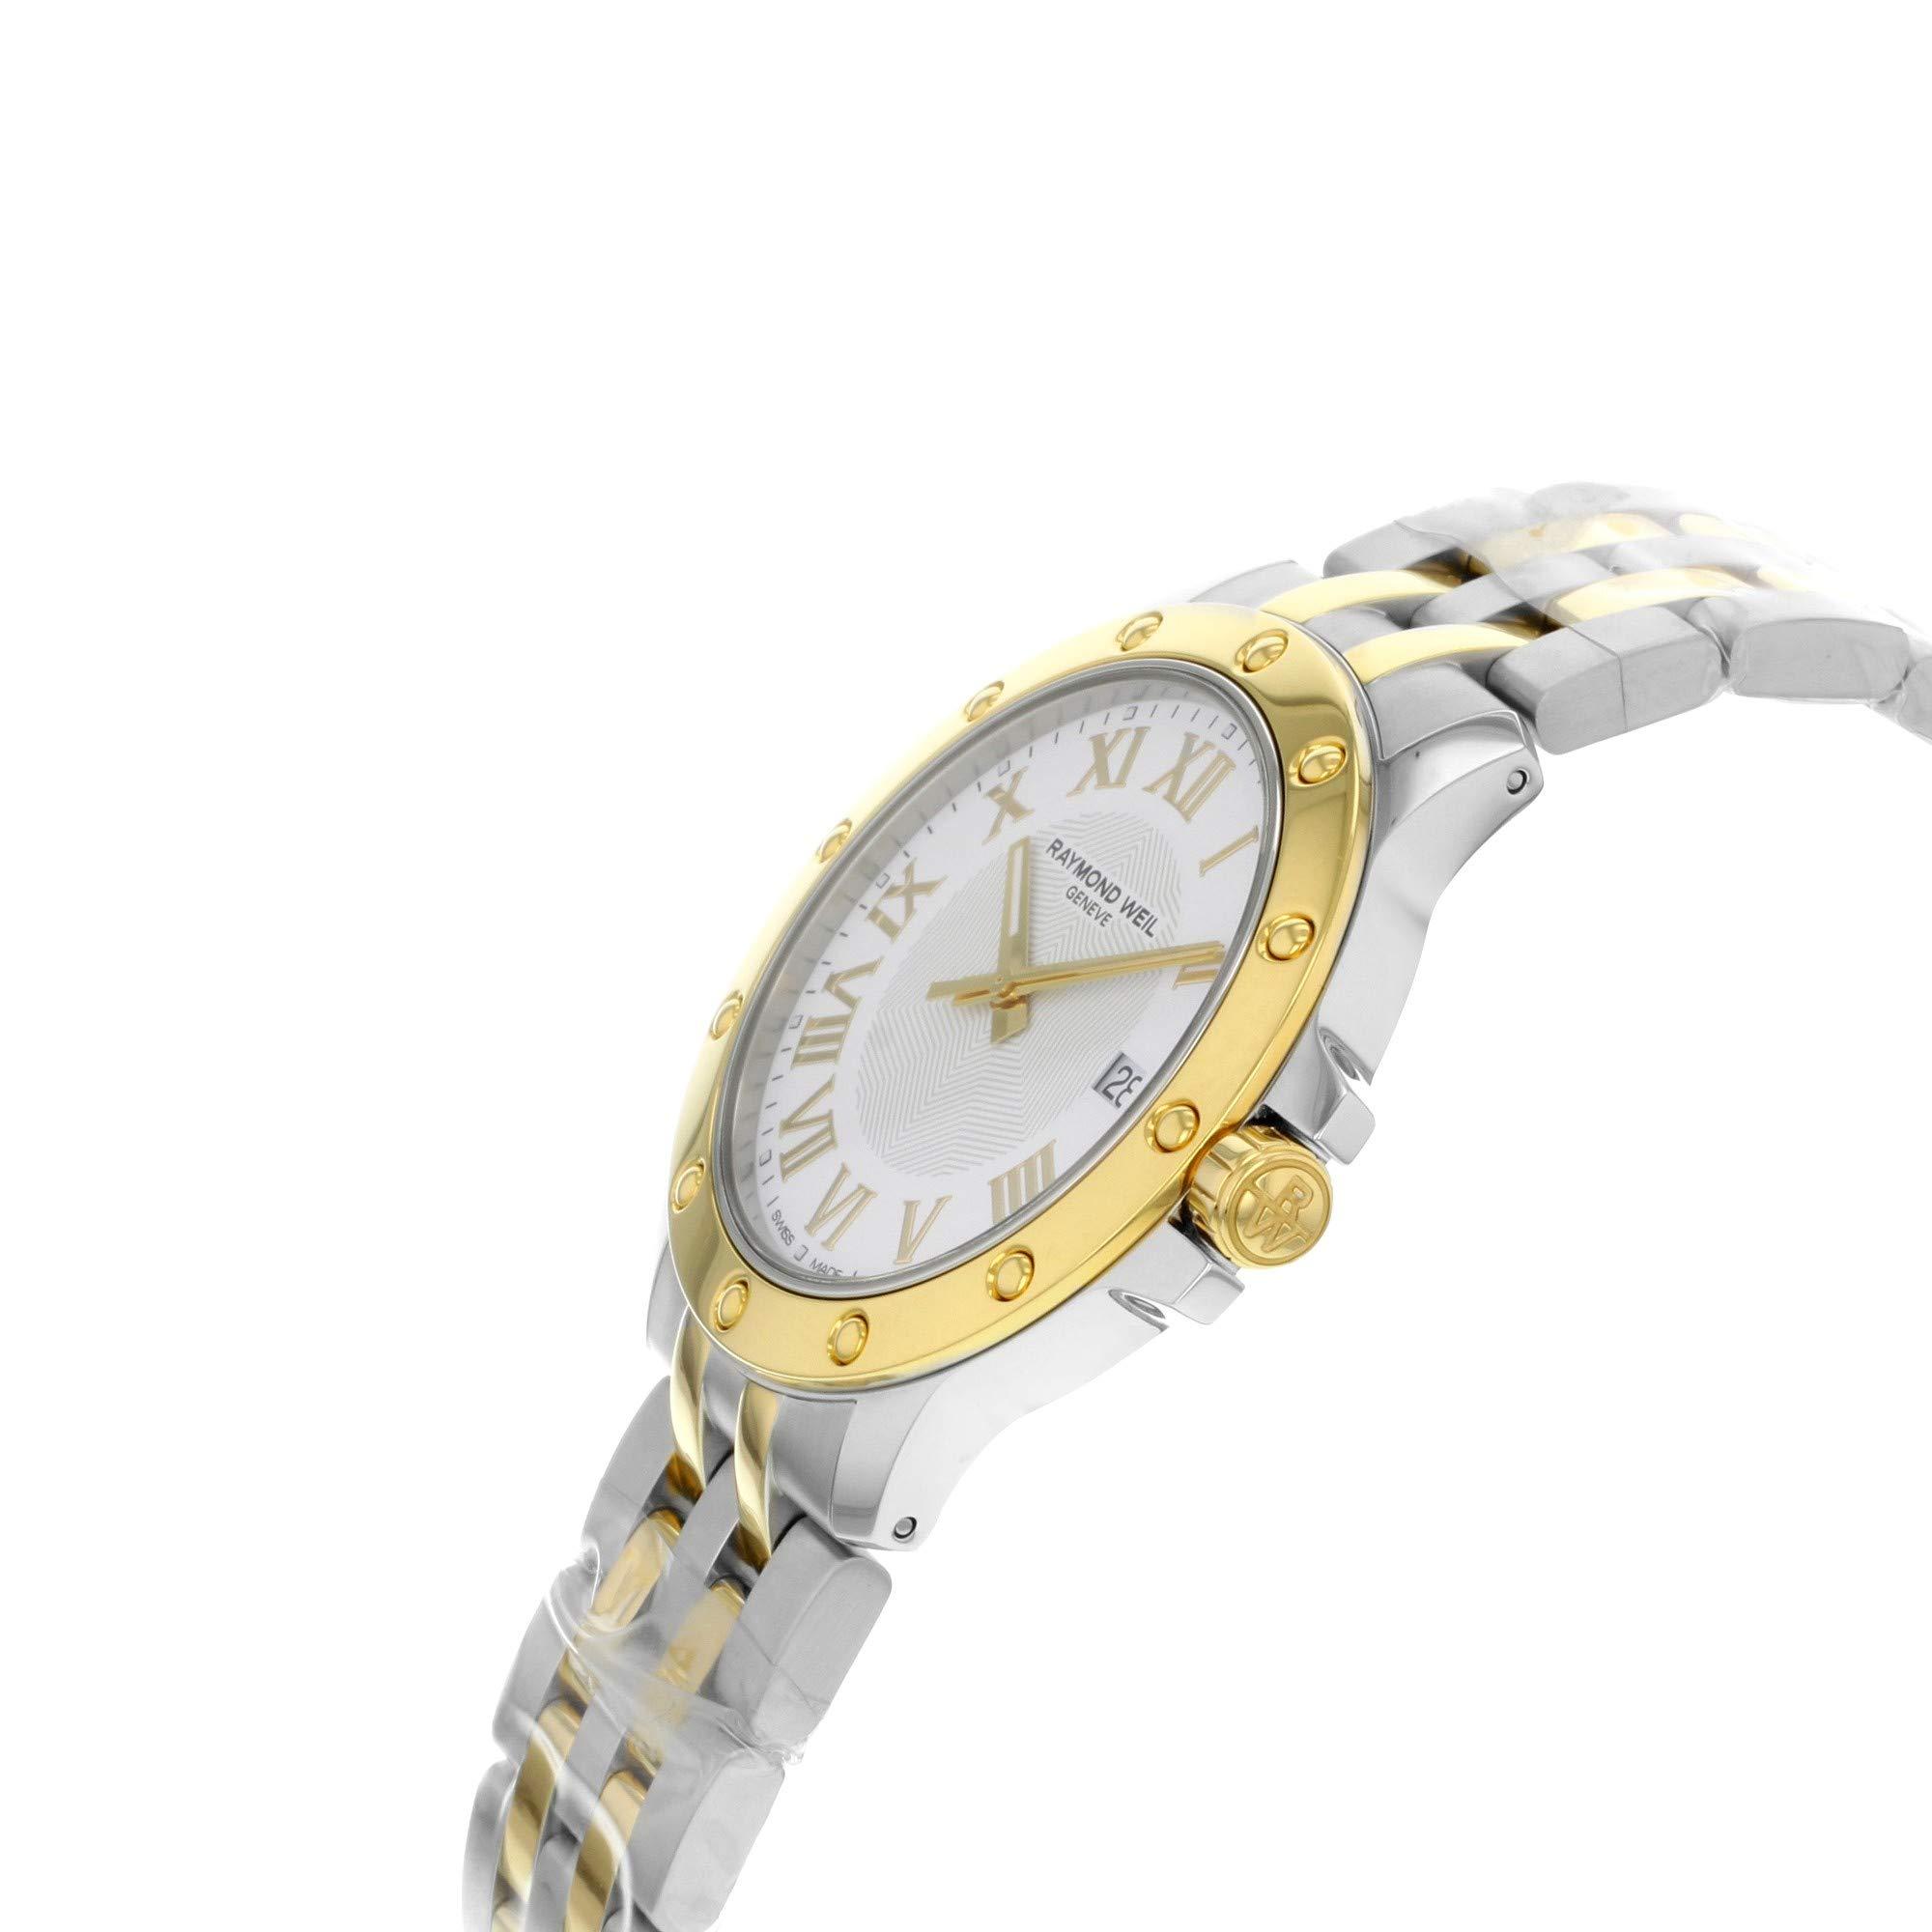 Raymond Weil Tango Quartz Male Watch 5599-STP-00308 (Certified Pre-Owned) by RAYMOND WEIL (Image #3)